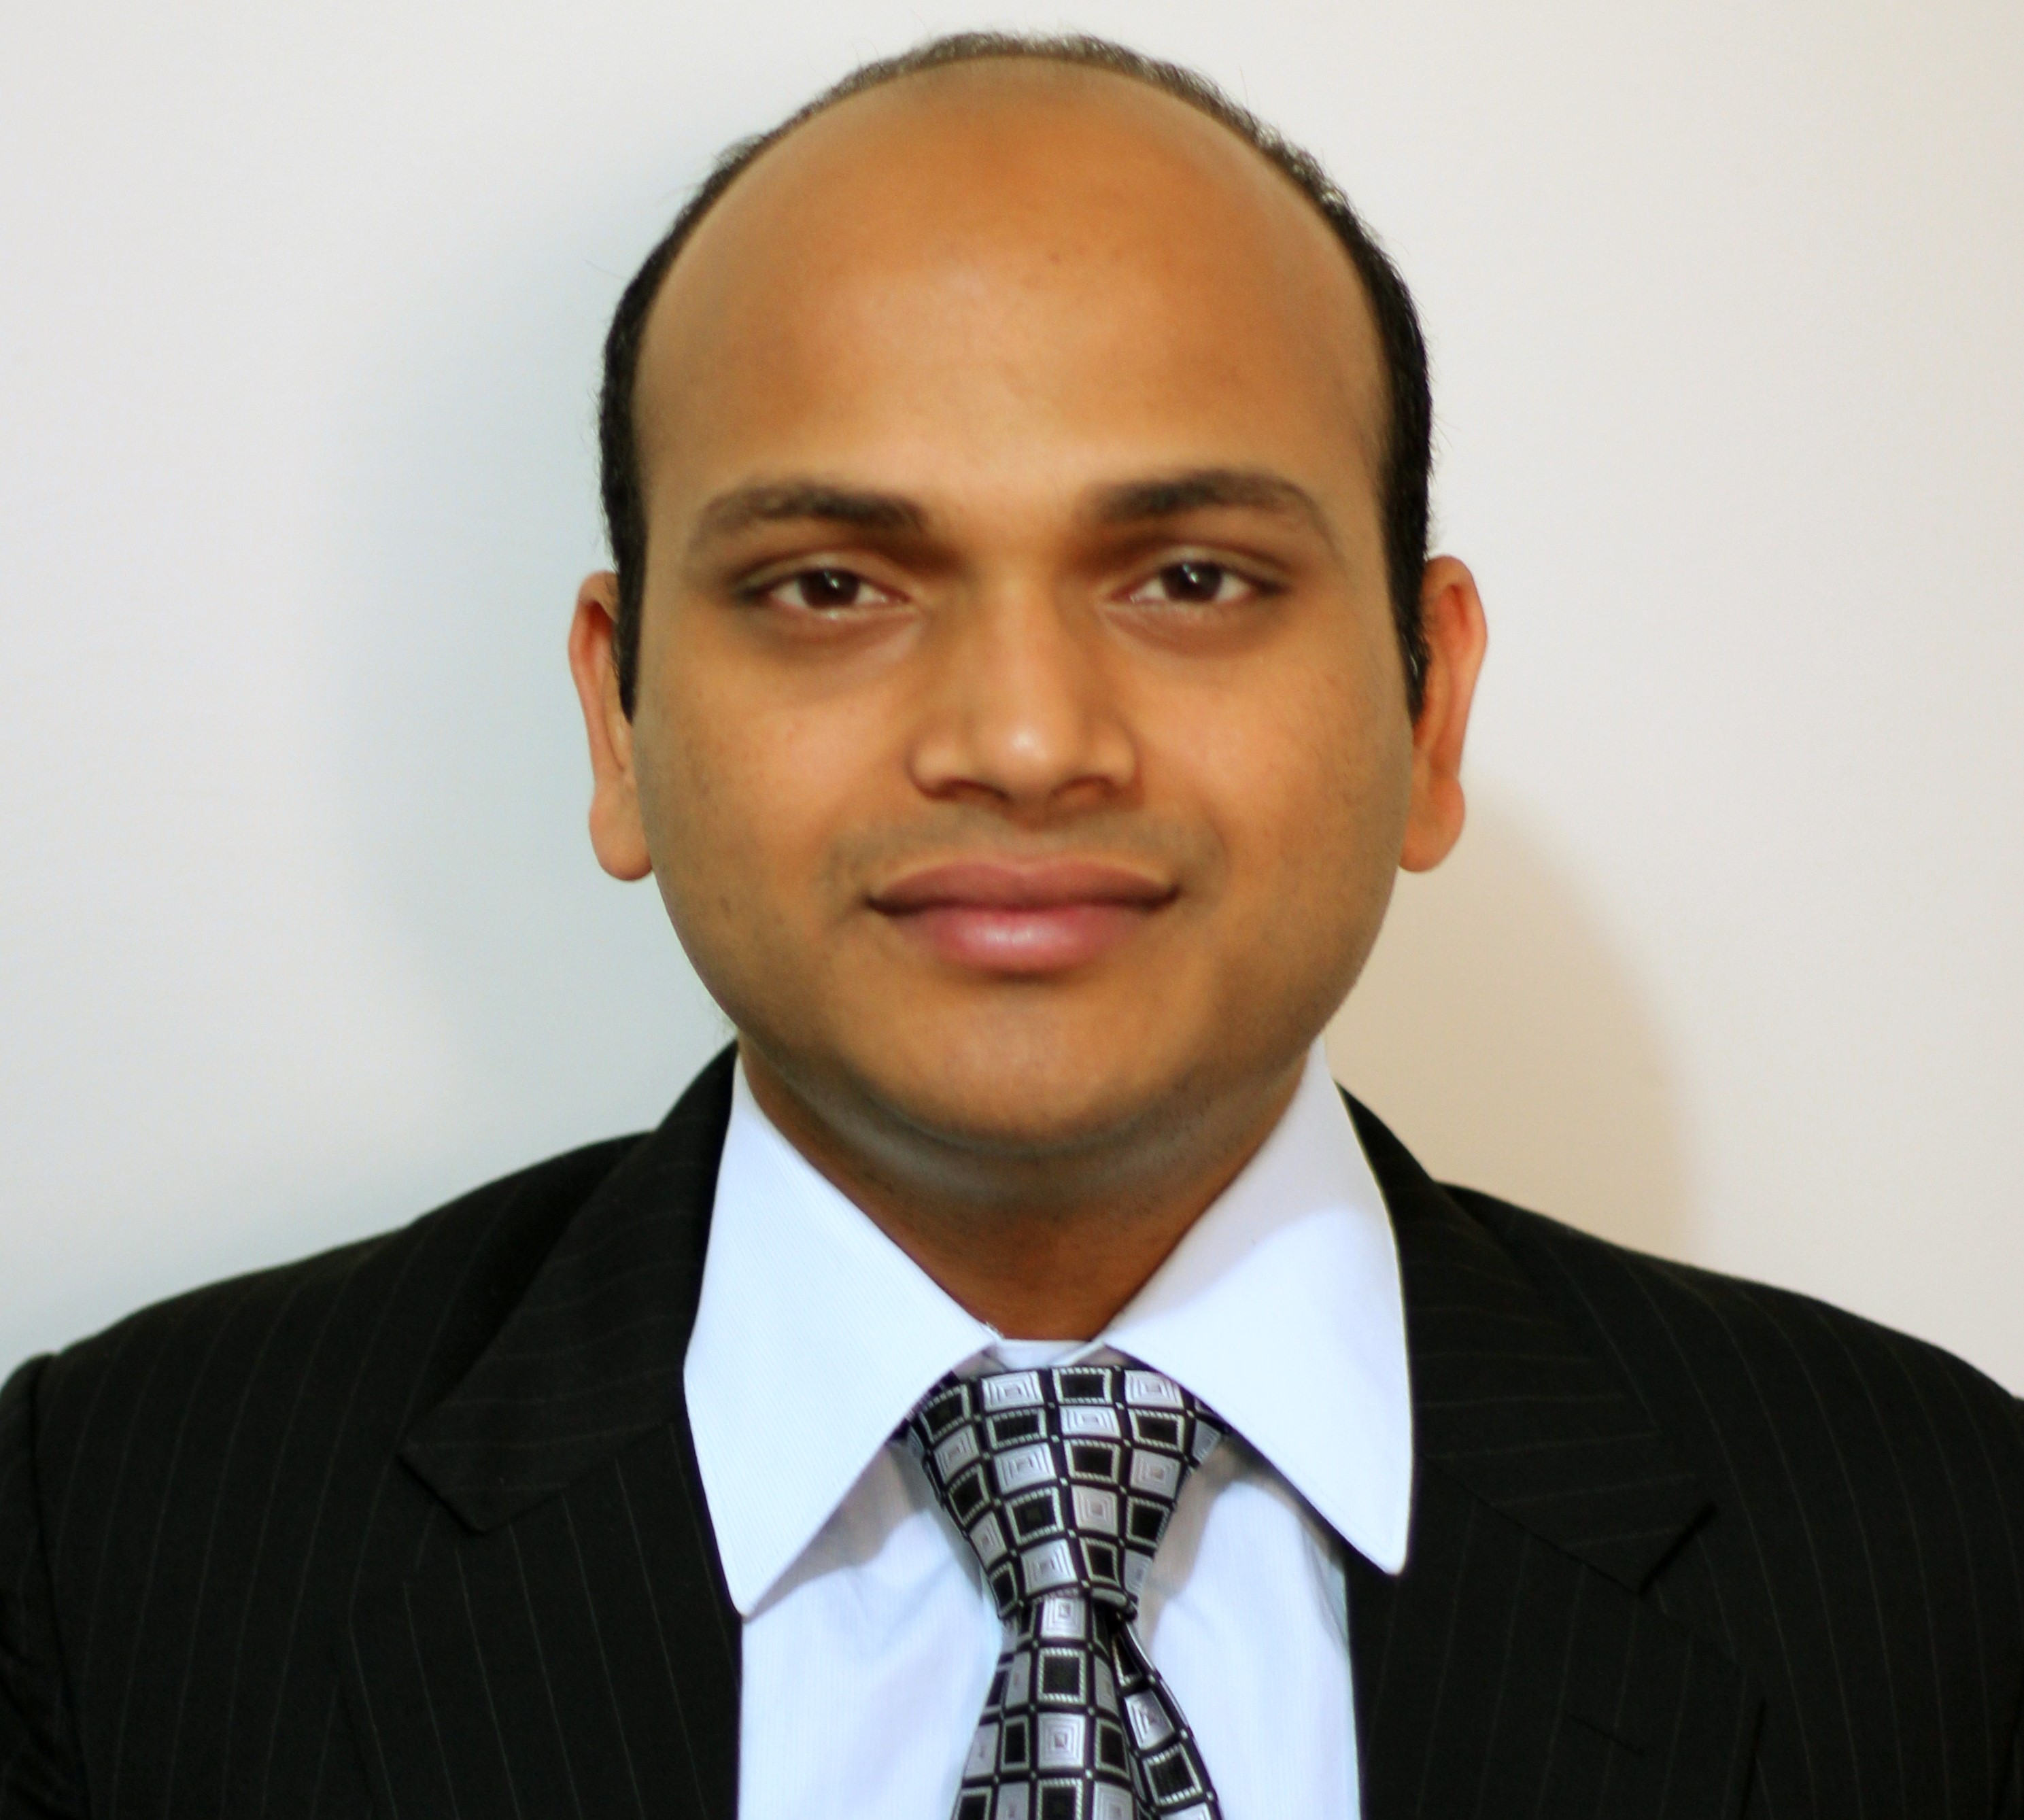 Vireshwar Kumar